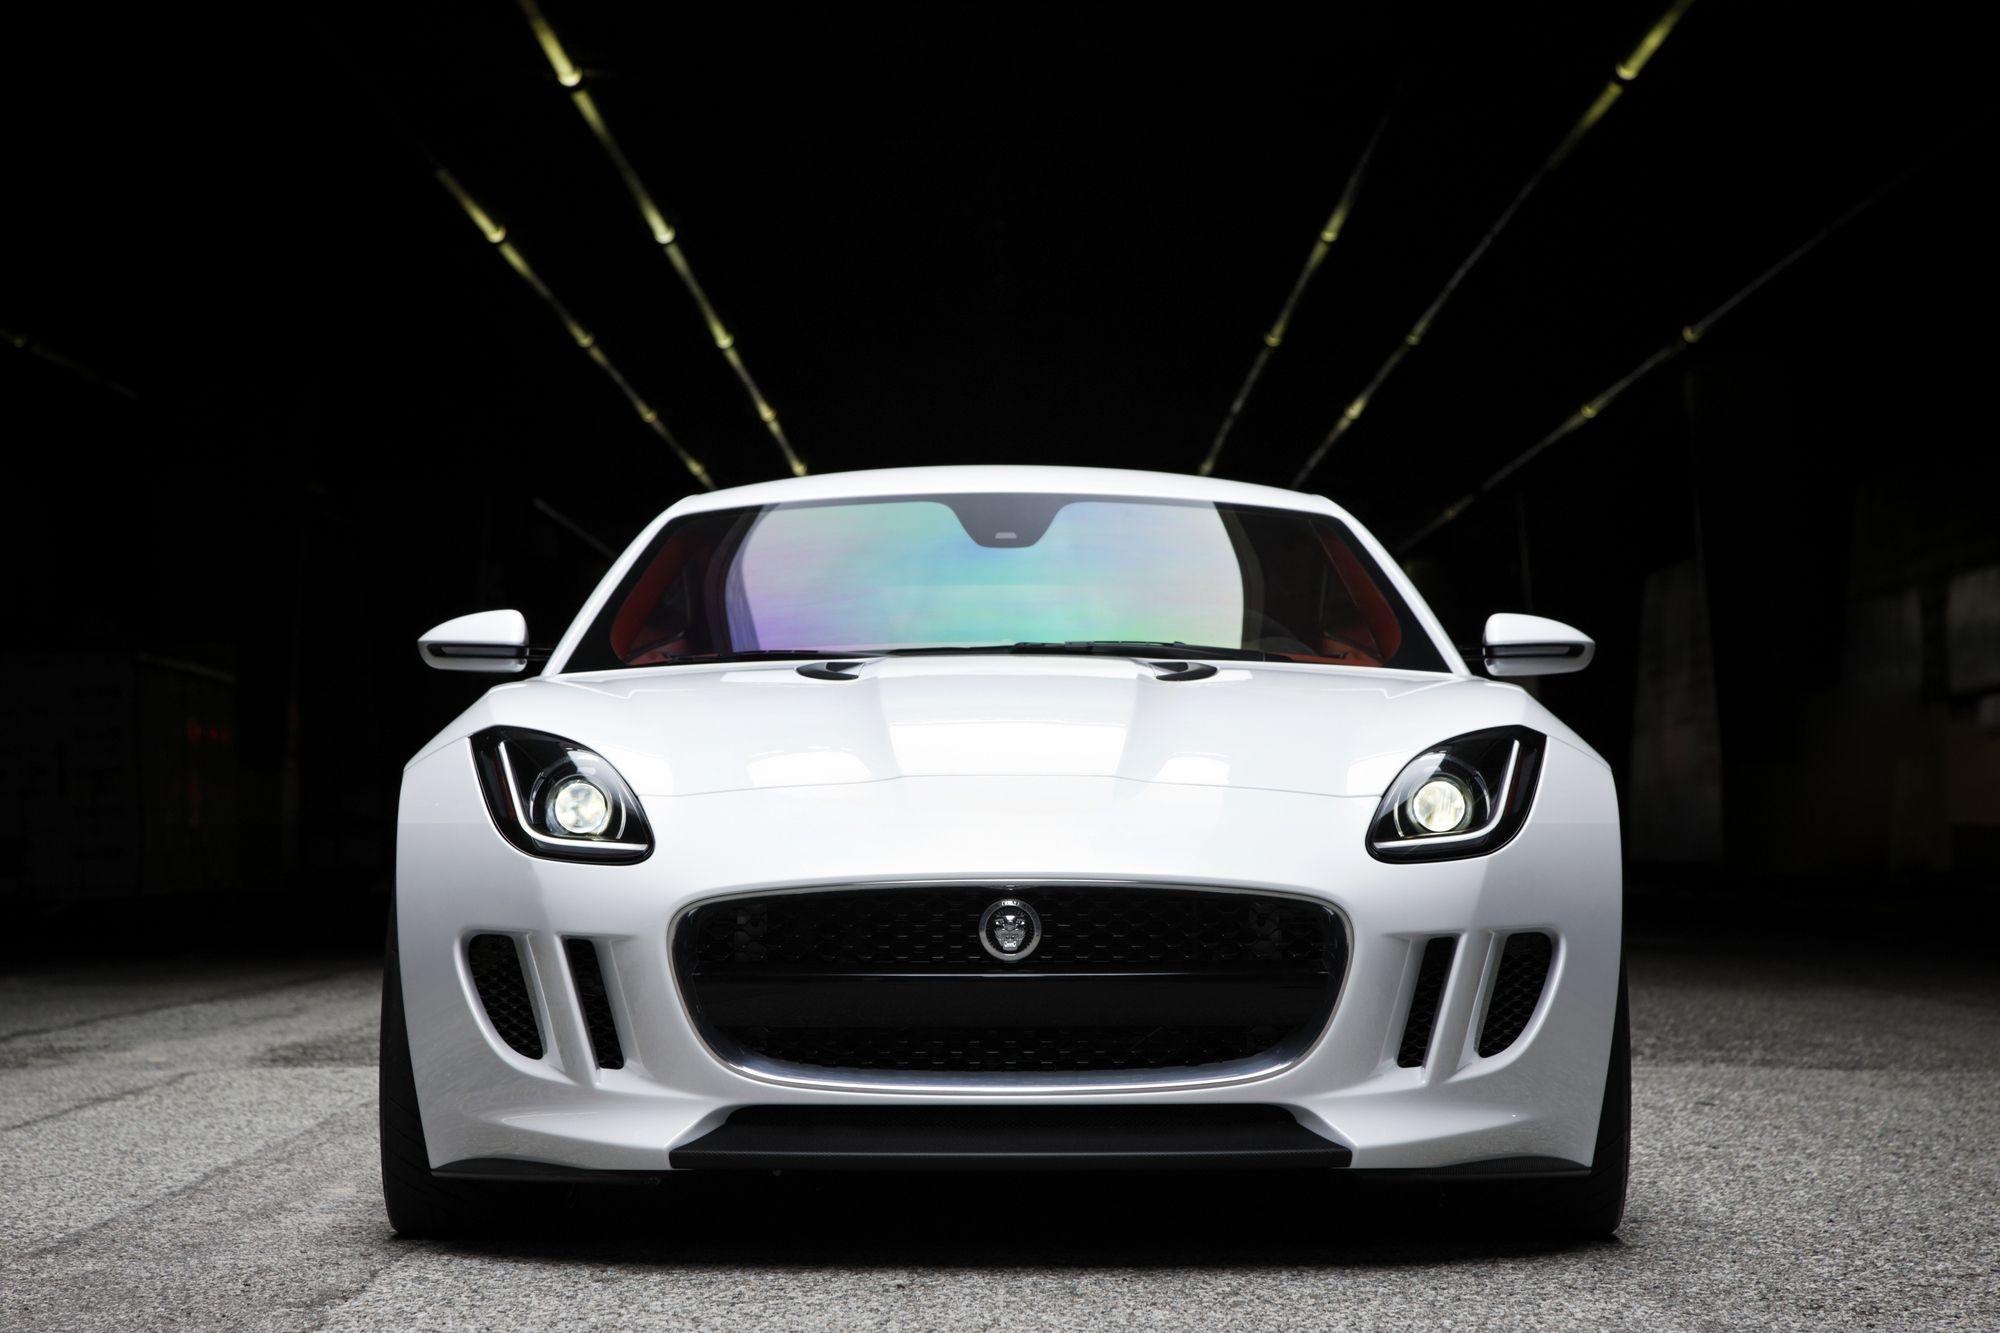 Wonderful Jaguar F Type White Wallpaper HD (2000×1333)